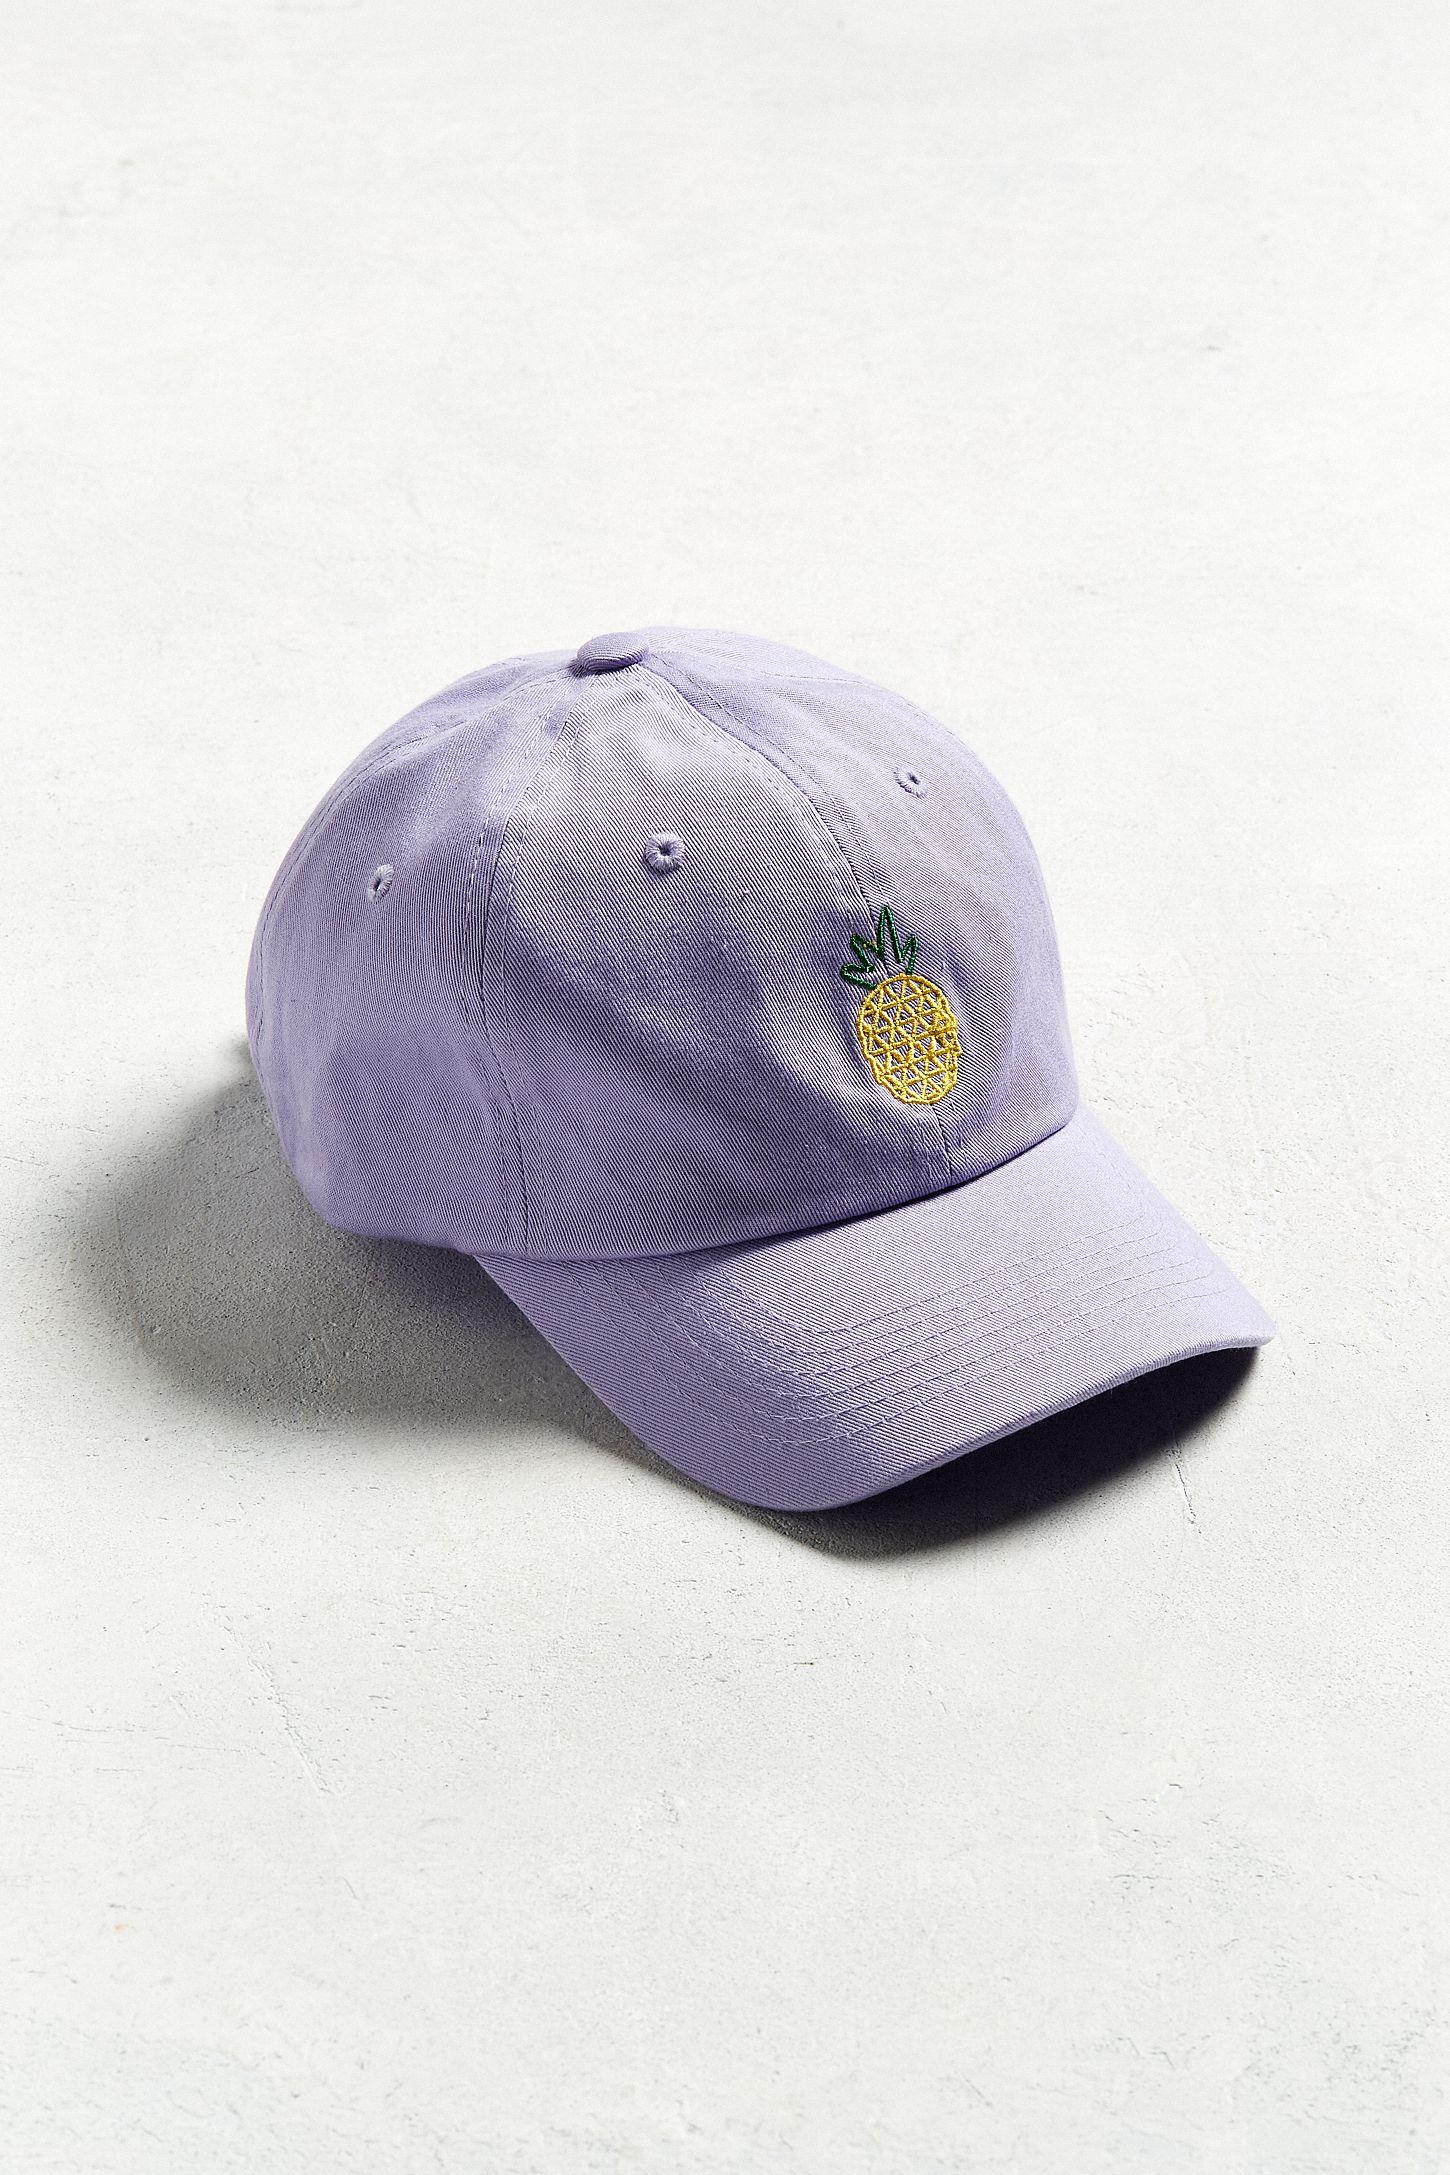 a7a3783a793b1 UO Pineapple Baseball Hat